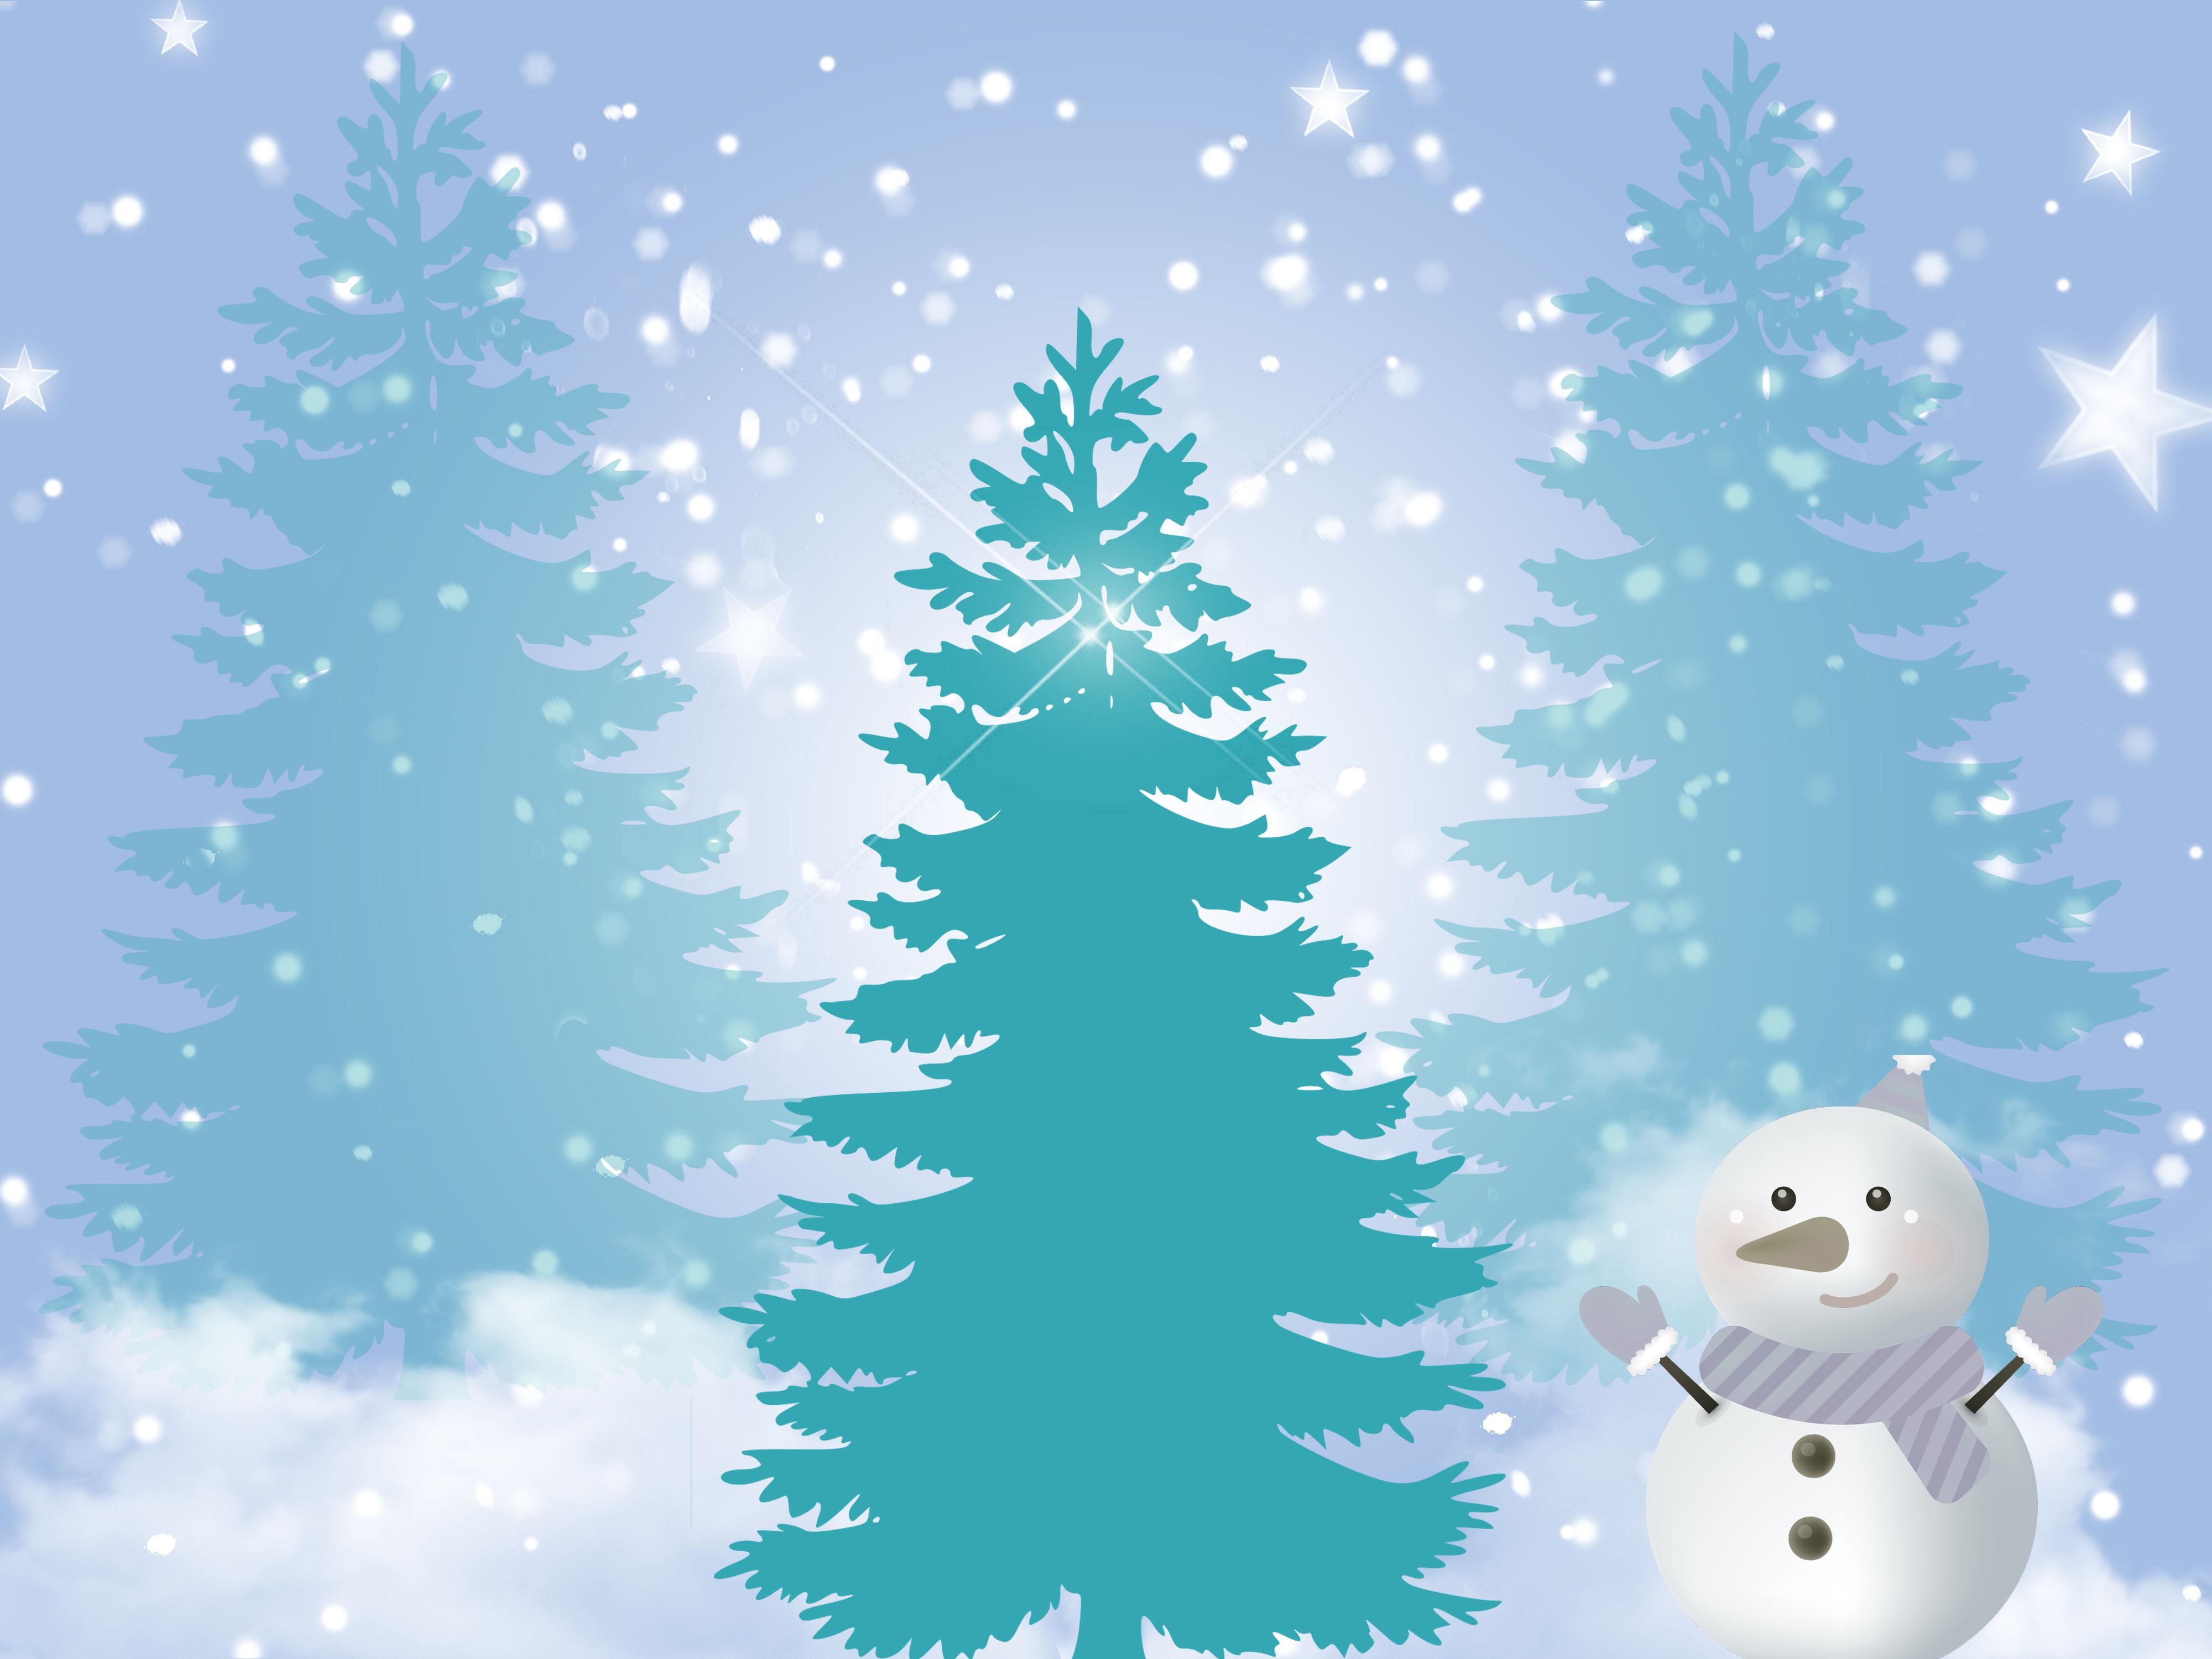 christmas christmas tree design merry christmas snow white blue spruce snowman christmas decoration tree pine family